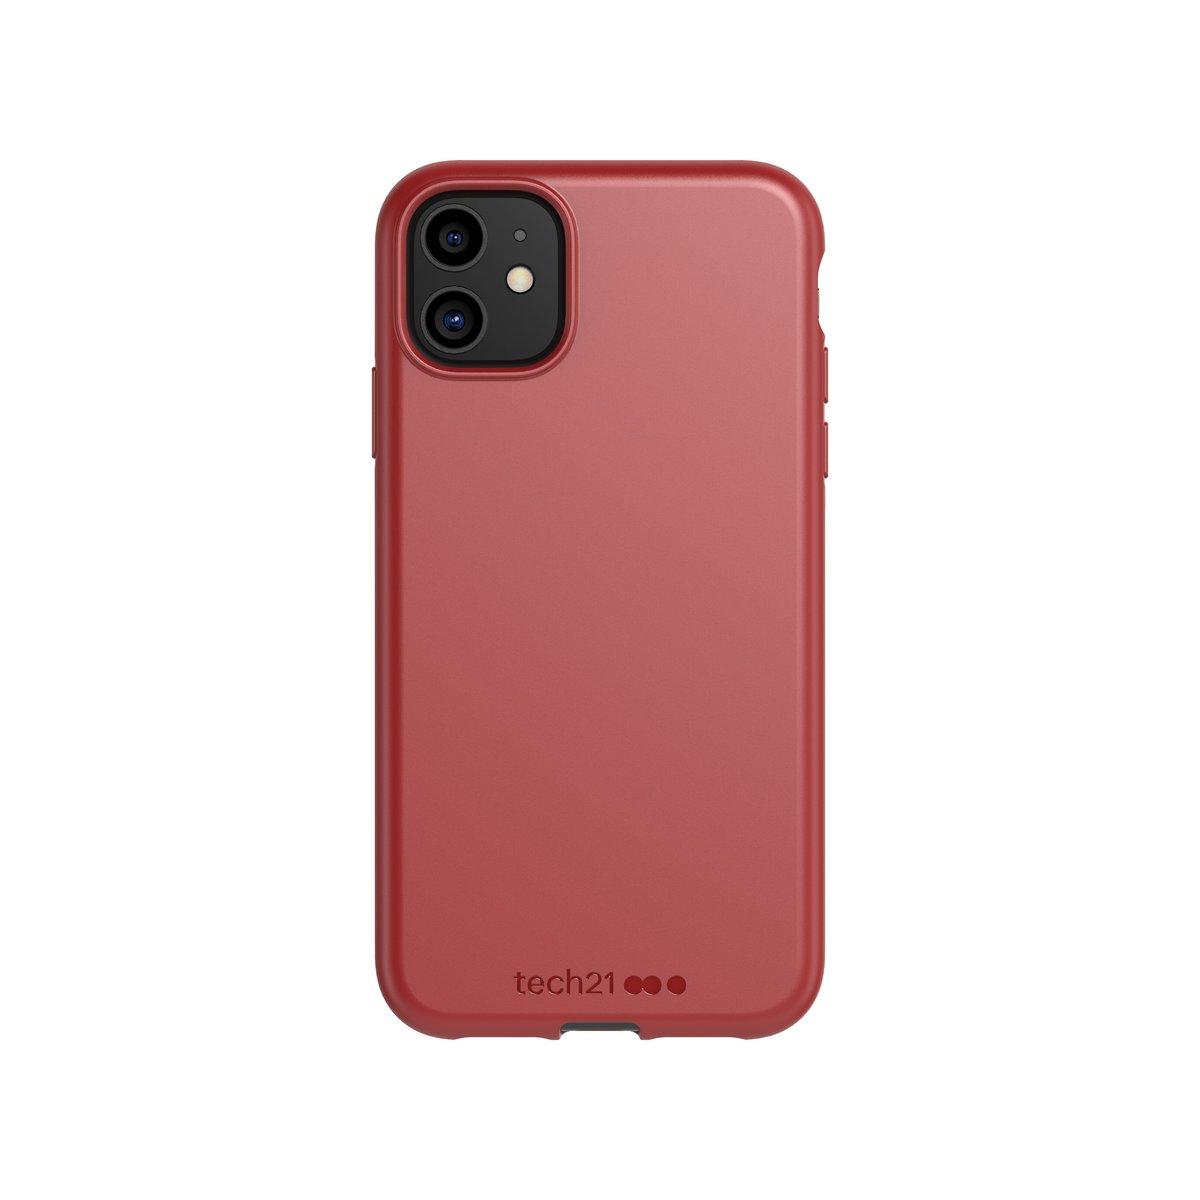 Studio Colour for iPhone 11 Pro - Terra Red